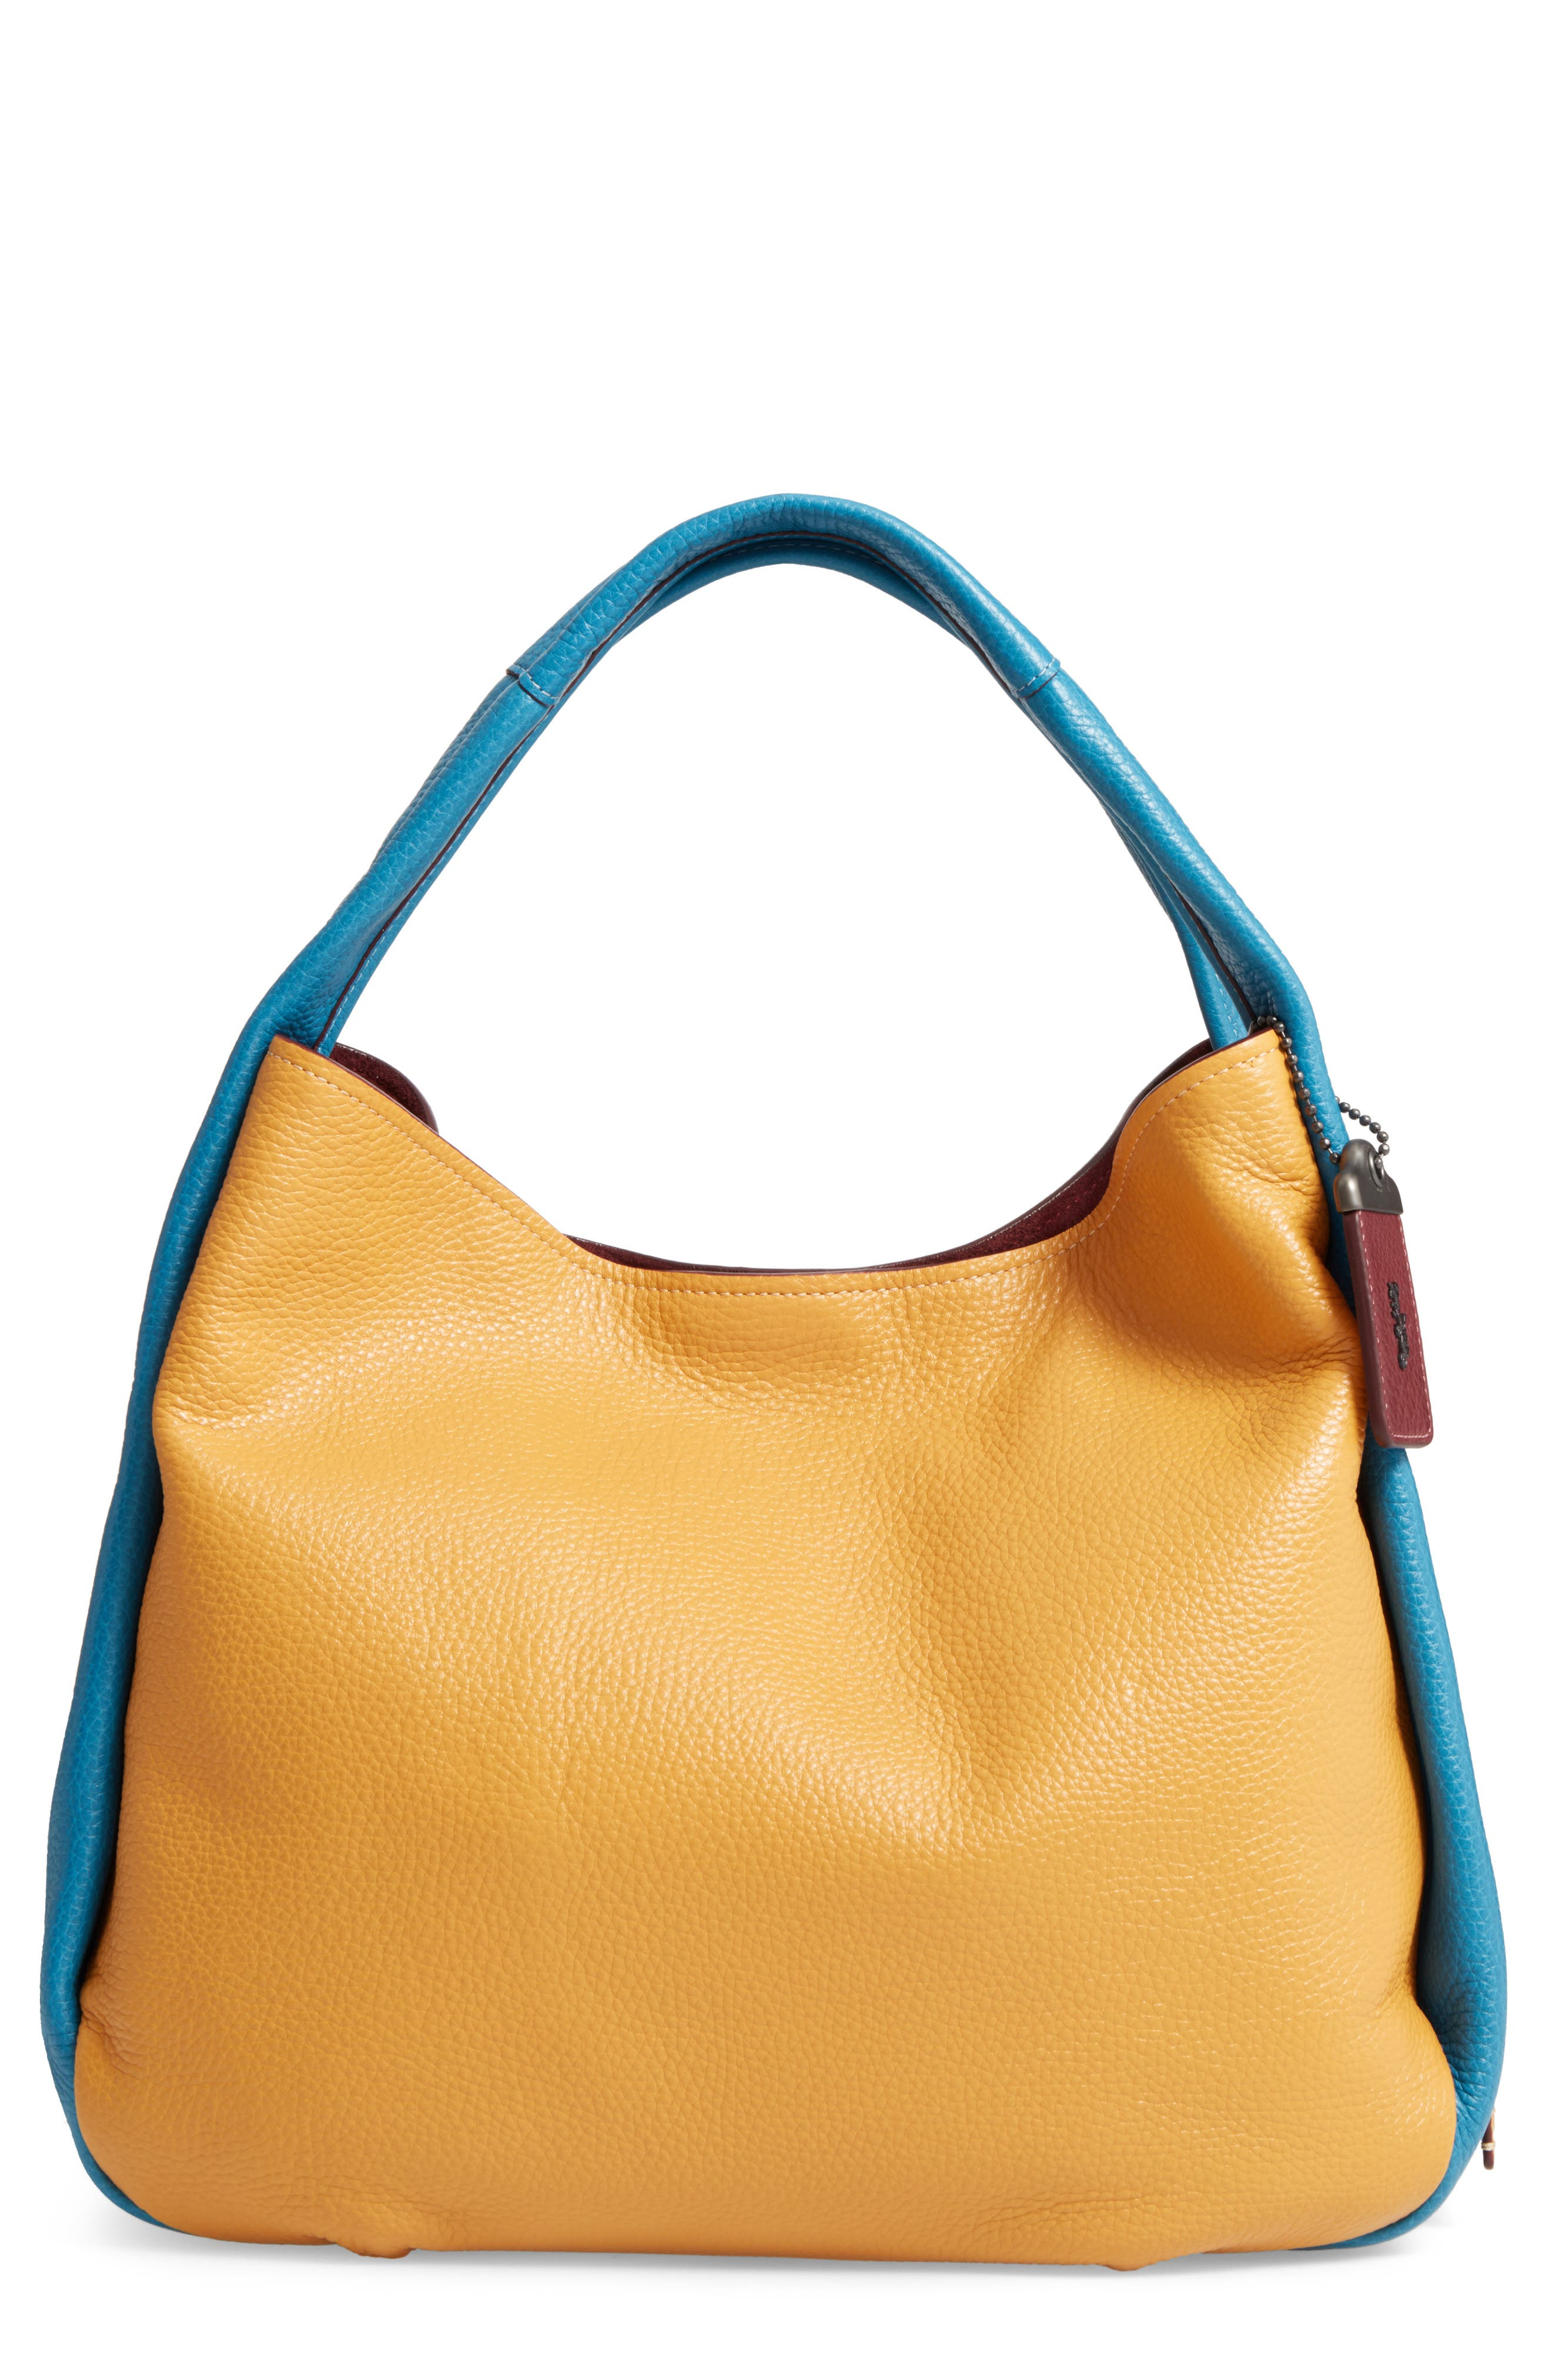 COACH 1941 Colorblock Bandit Leather Hobo Bag